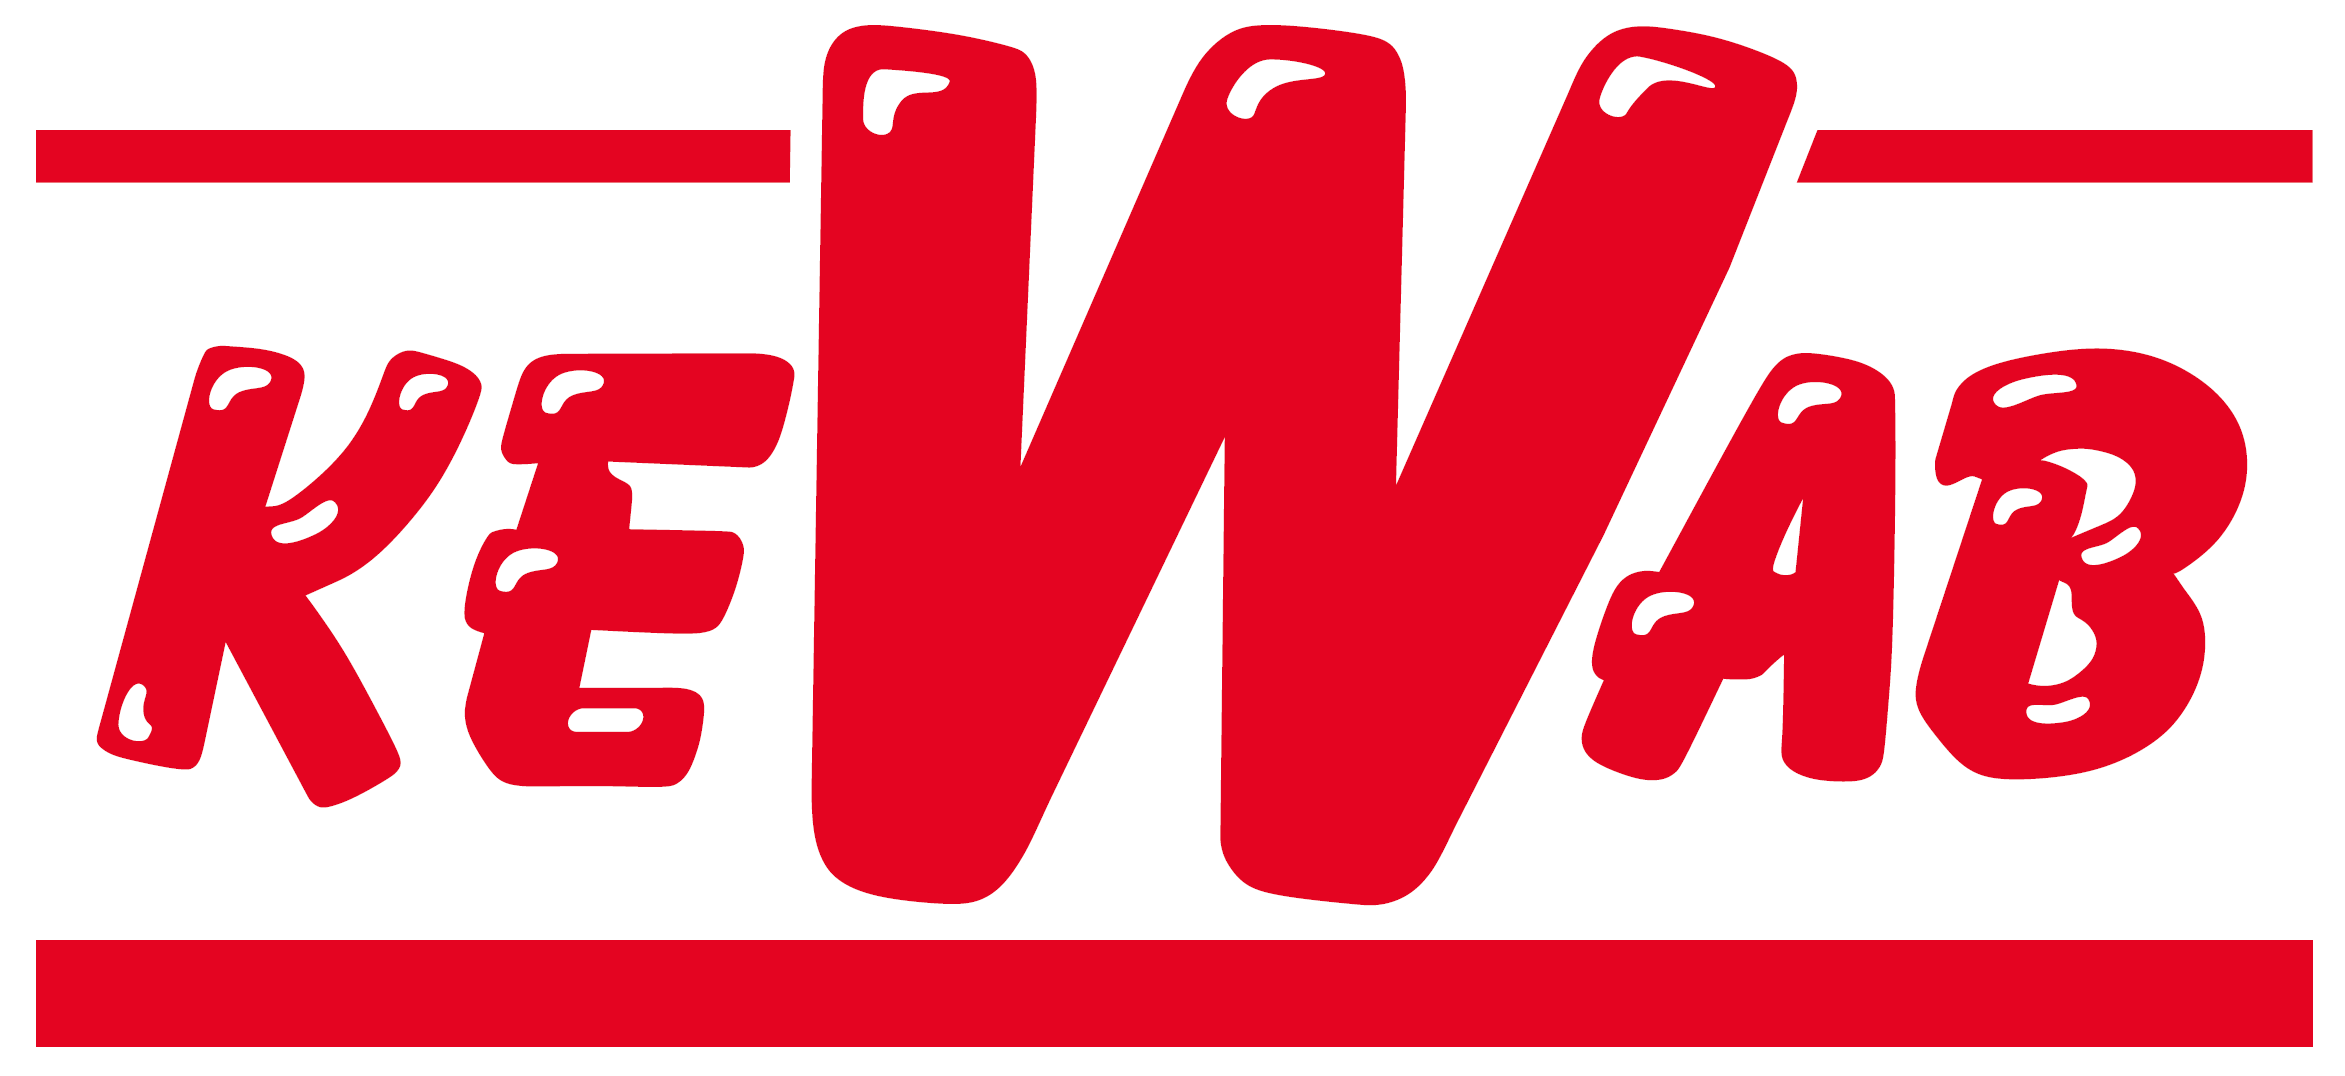 Kewab_logo_röd.png